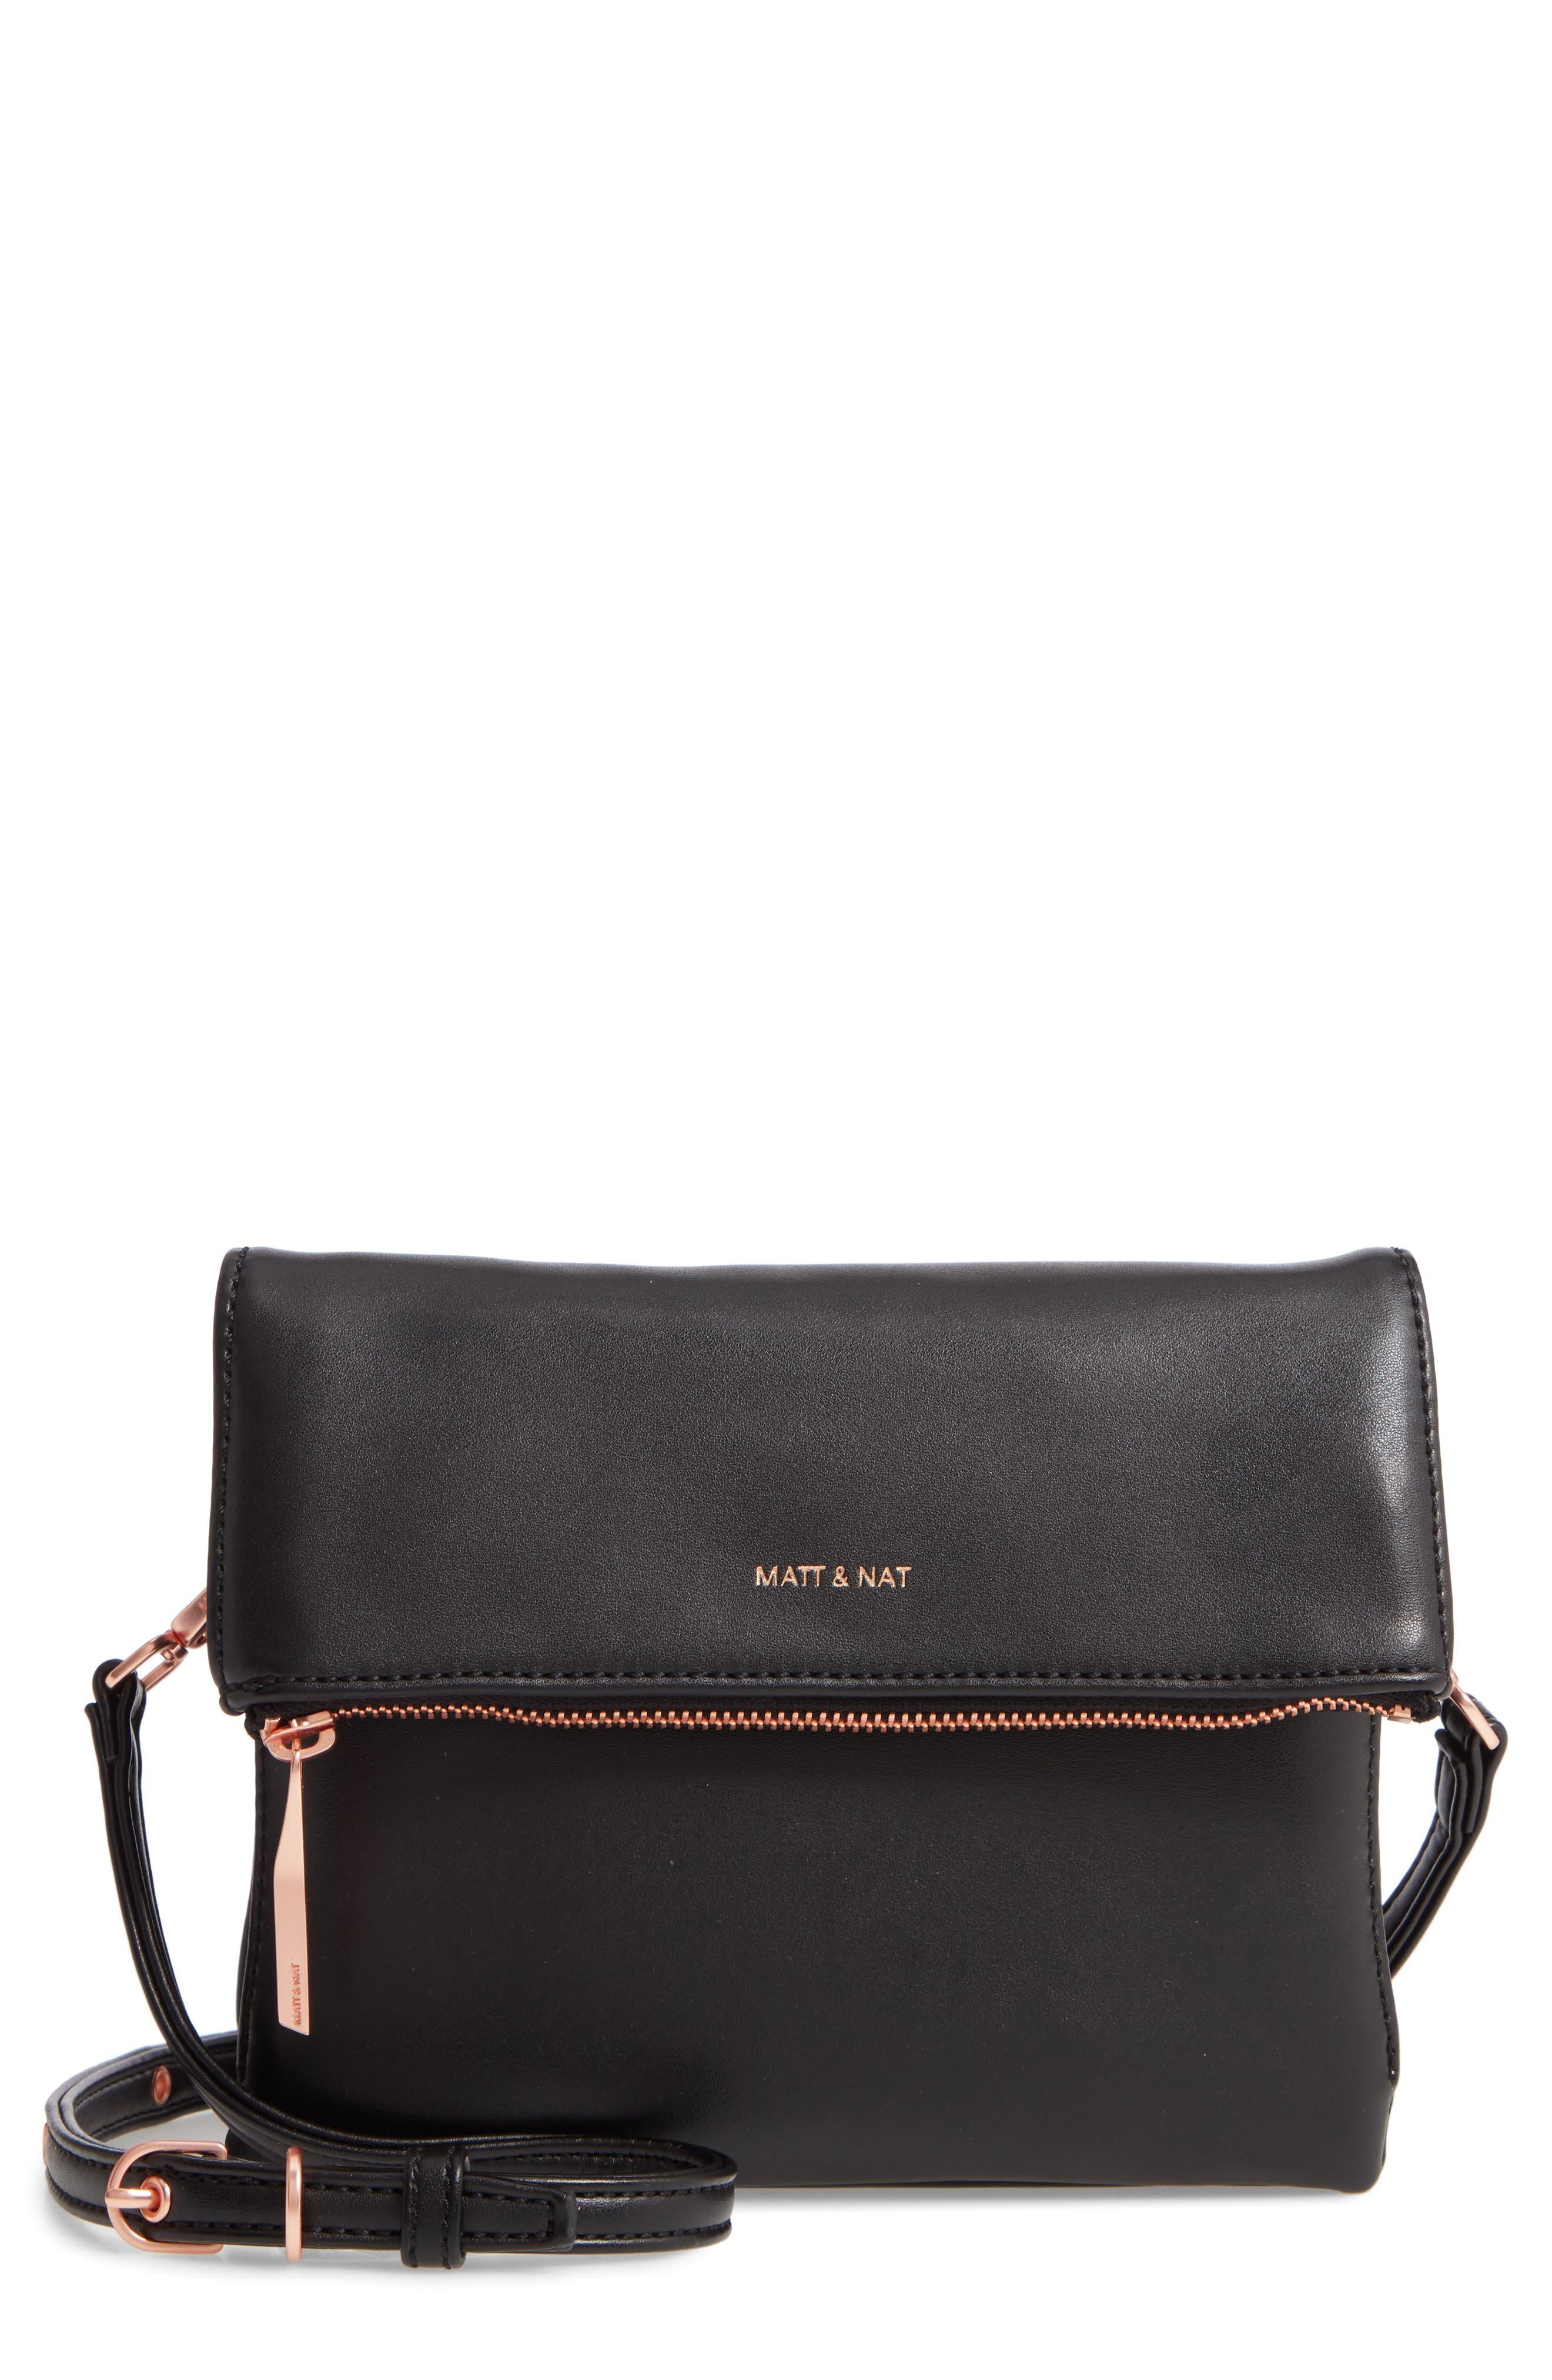 Matt & Nat Hiley Faux Leather Crossbody Bag - Black